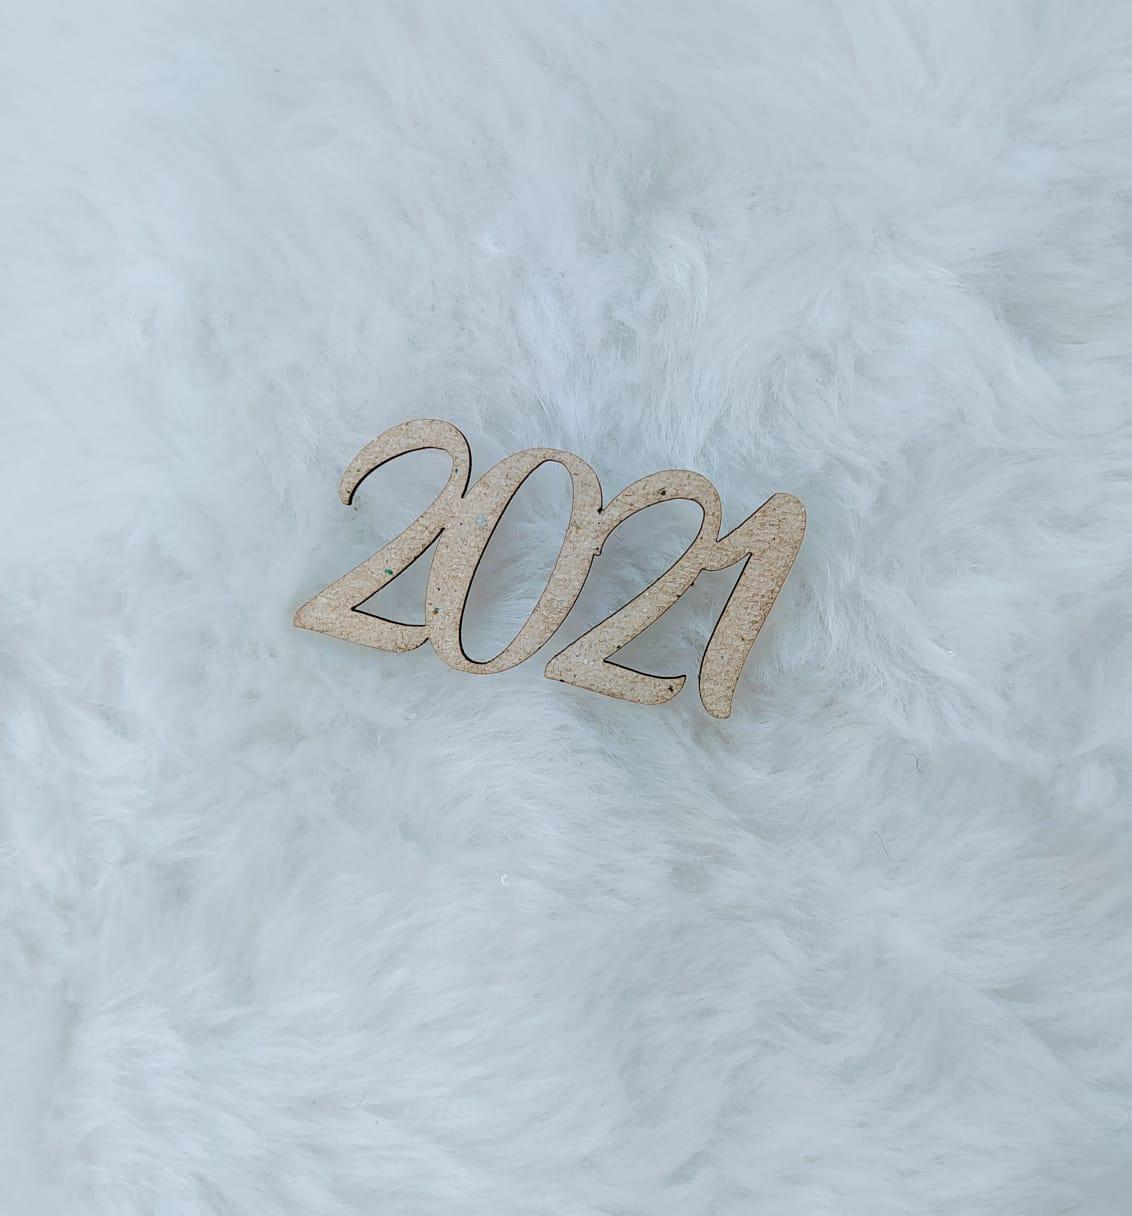 Aplique Chipboard - 2021 - 5cm - 10 peças - Natal